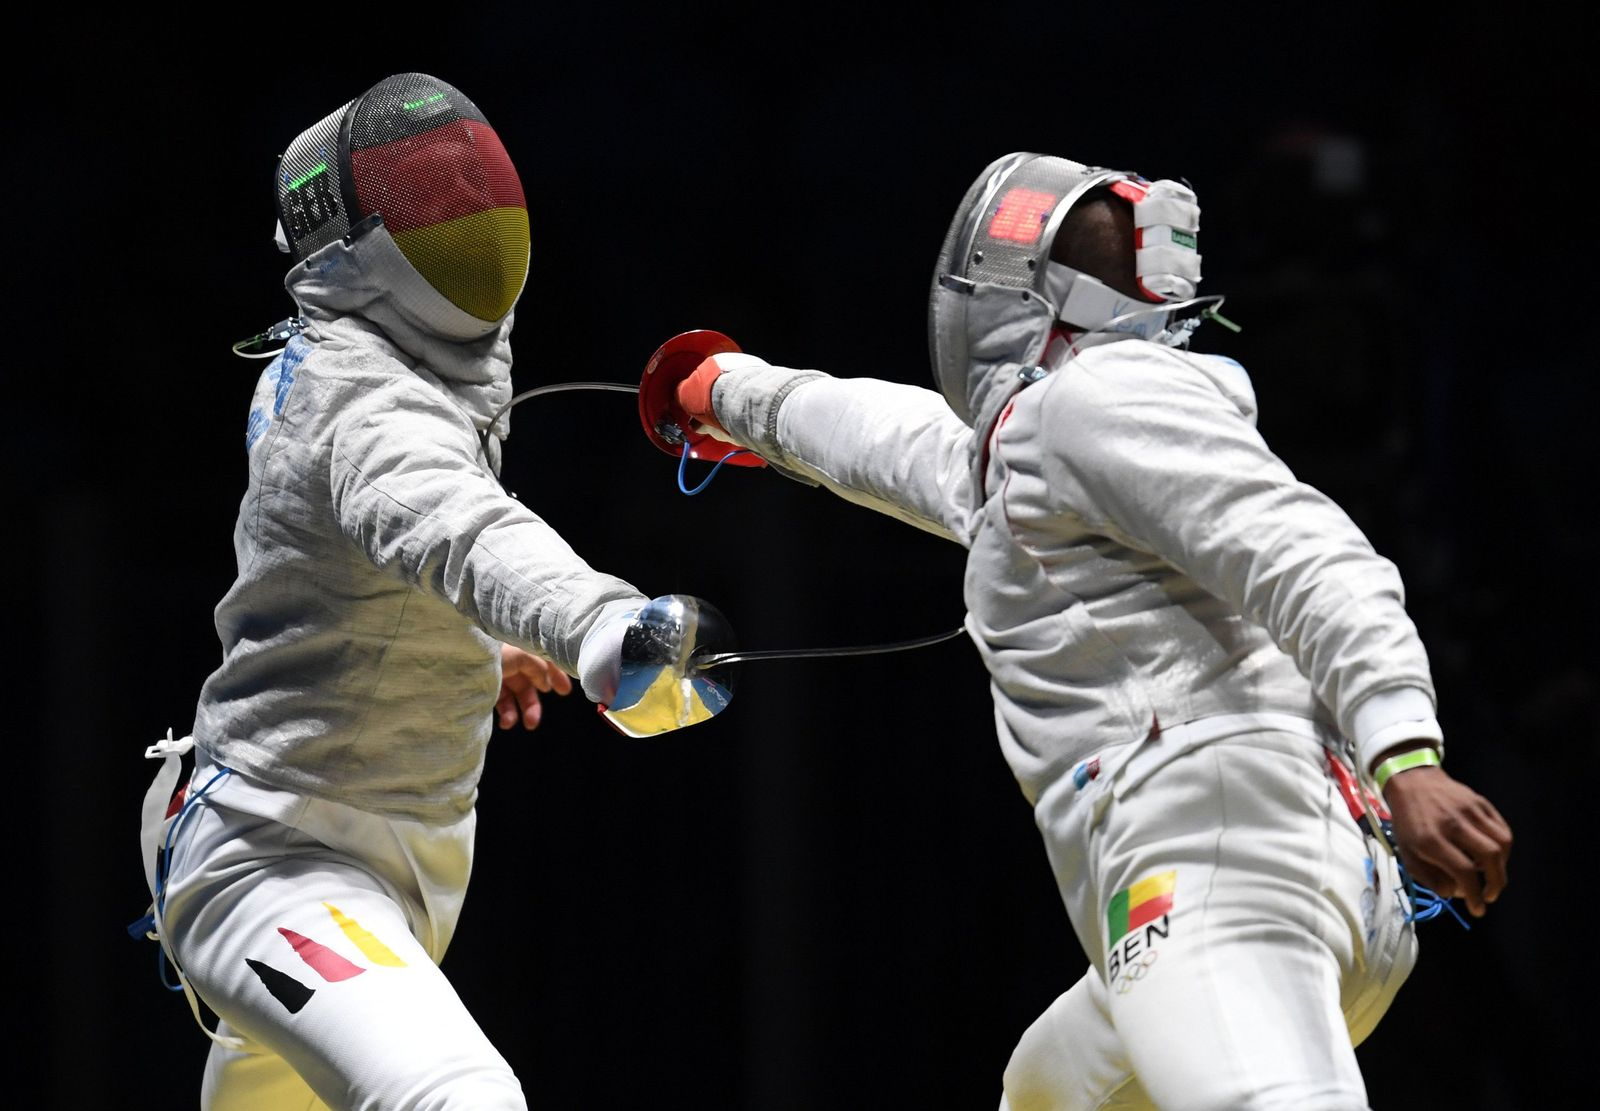 Rio 2016 - Fechten